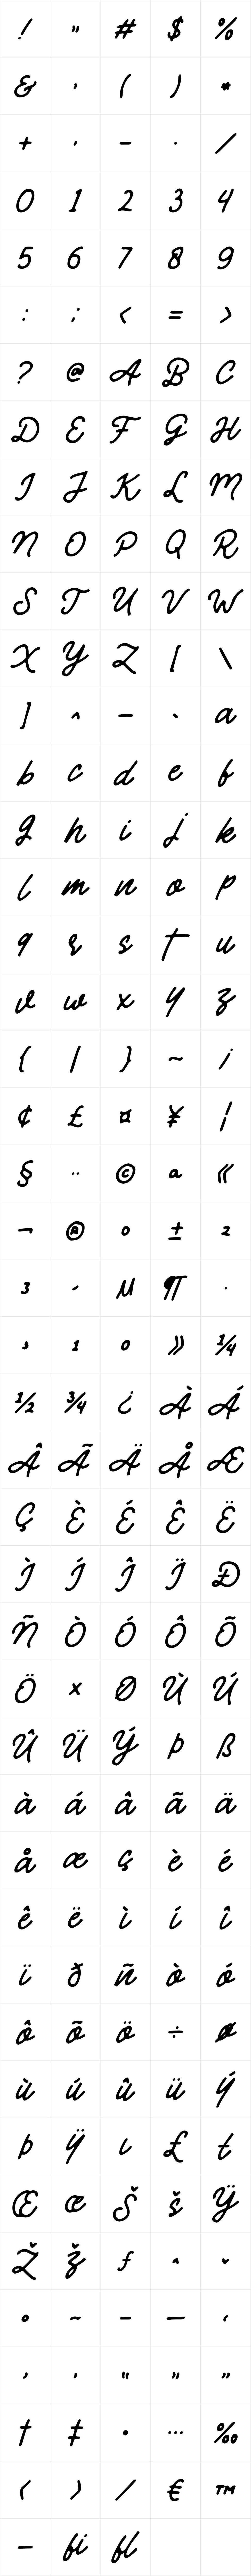 Mandatory Script